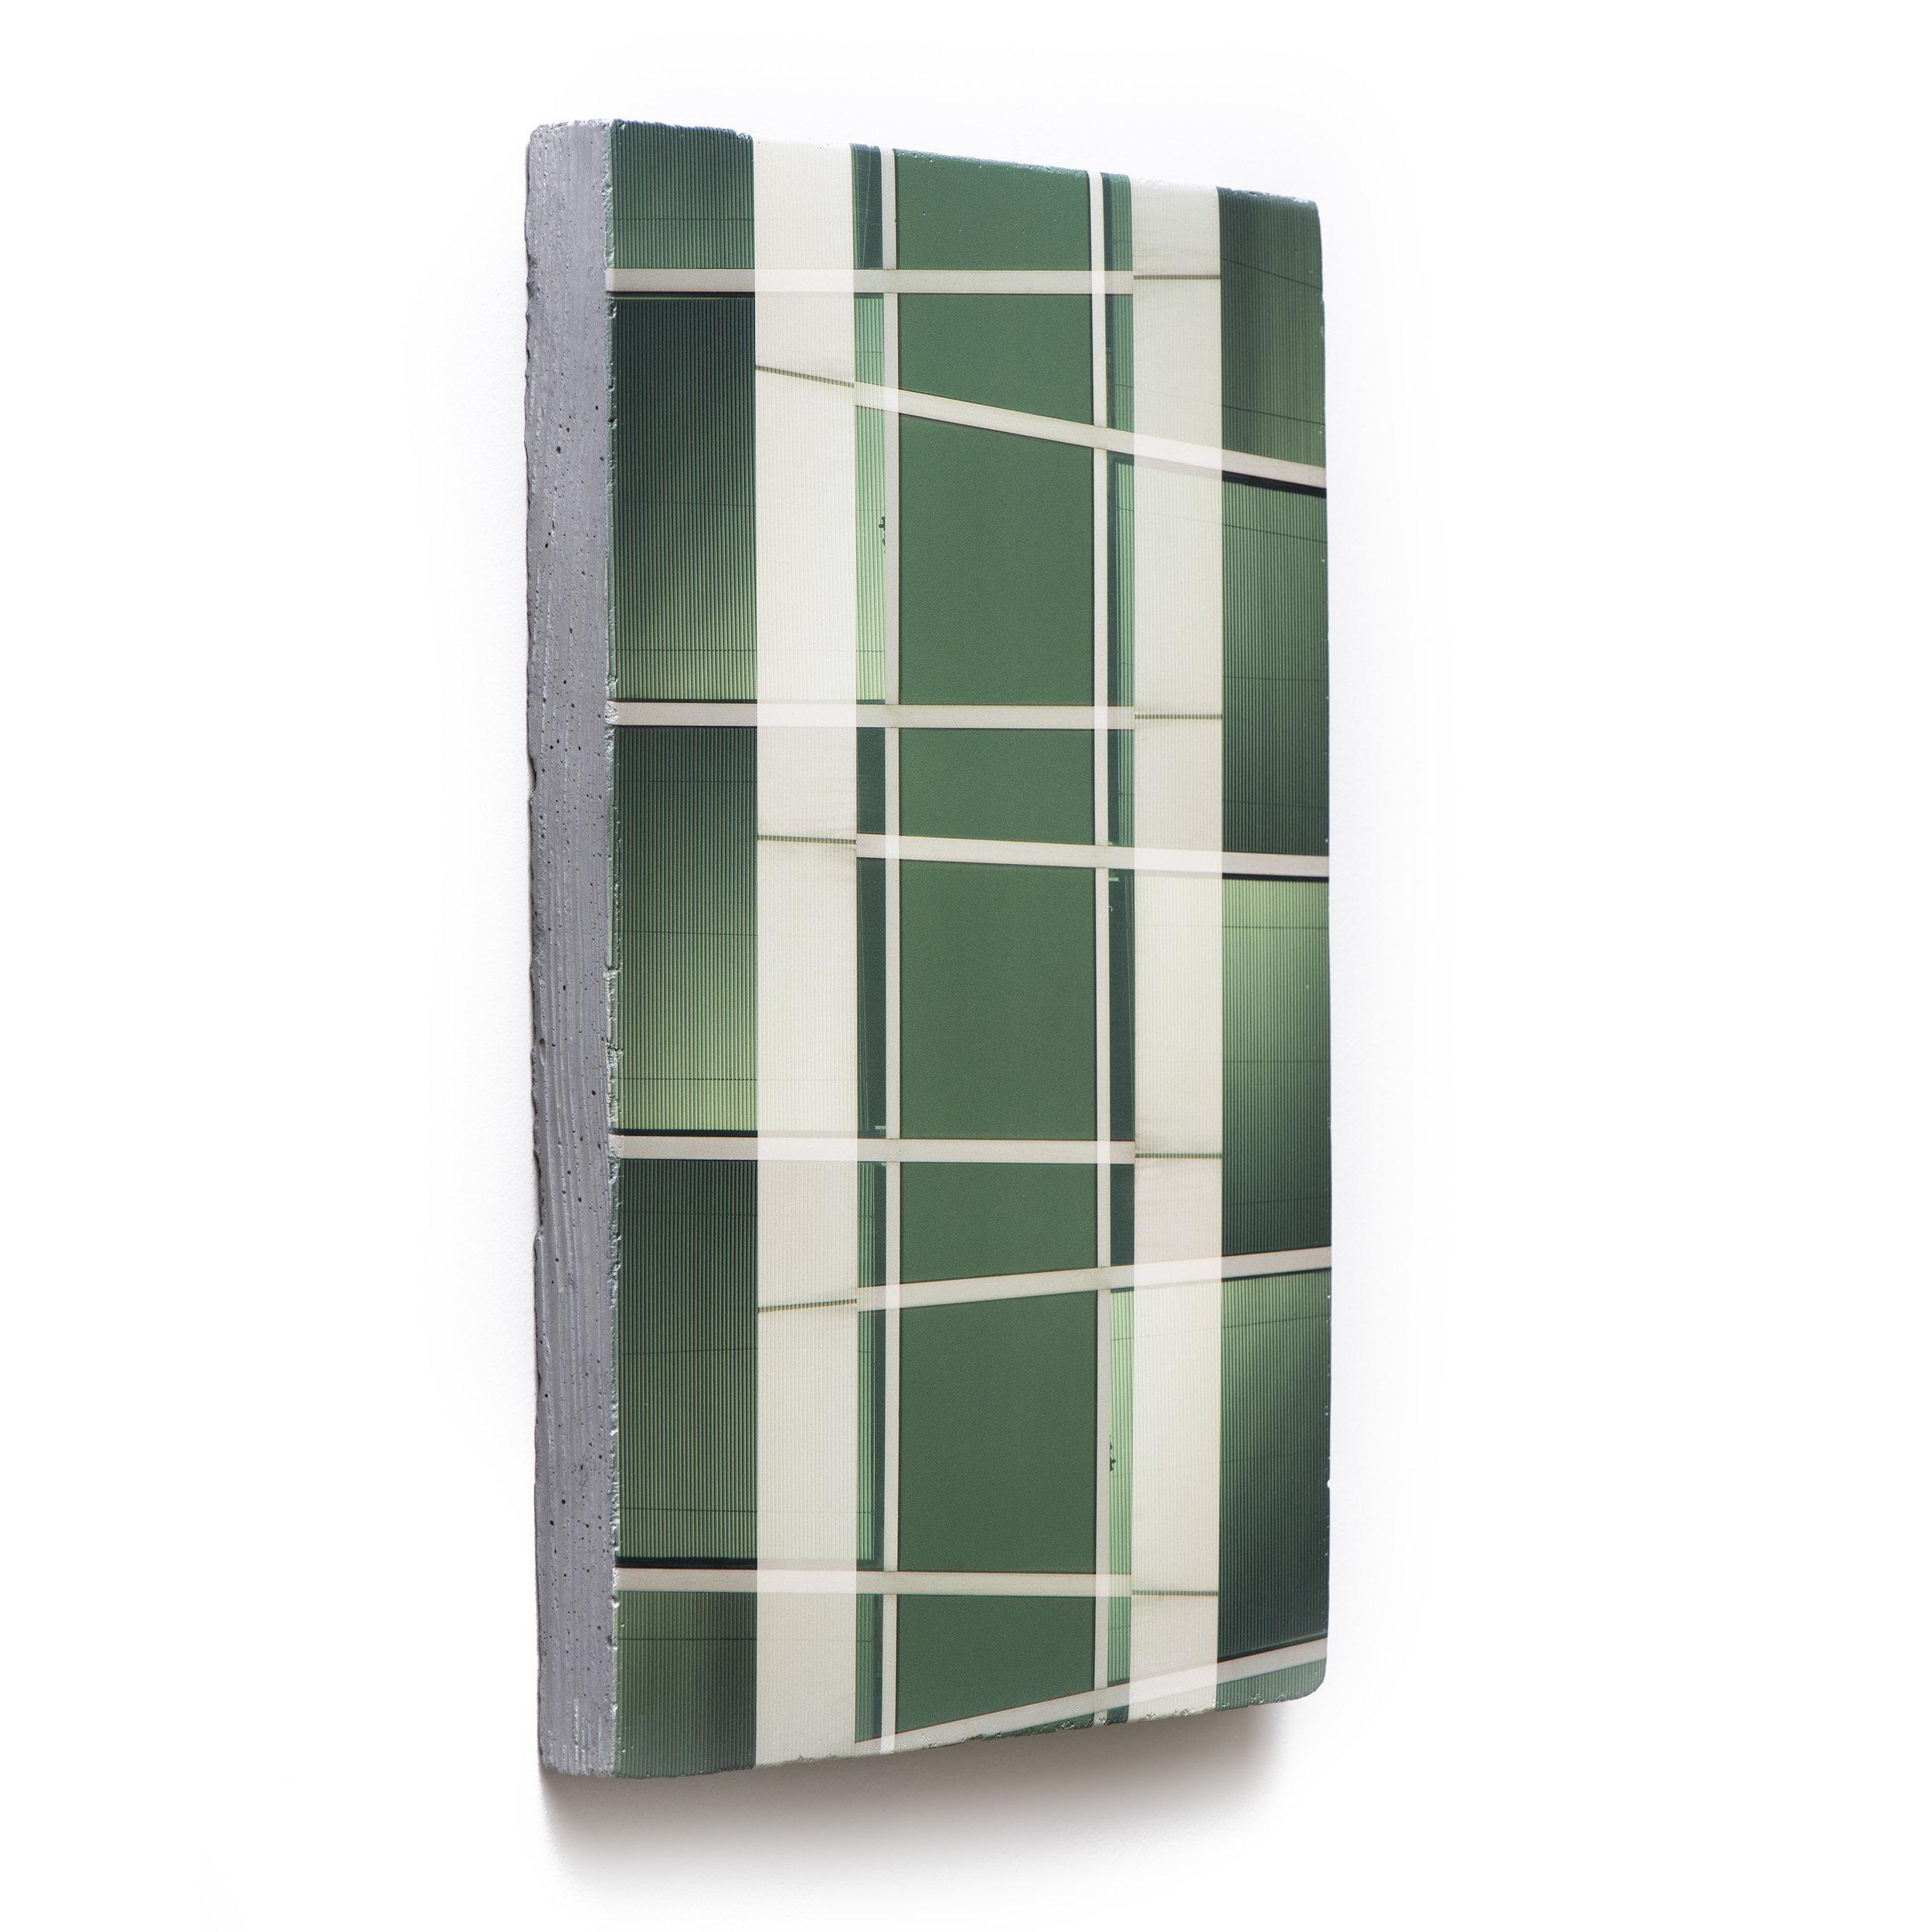 Counterform Ladder, 2017 (oblique) UV ink on concrete 18 1/2 × 12 1/2 × 1 1/2 in Unique